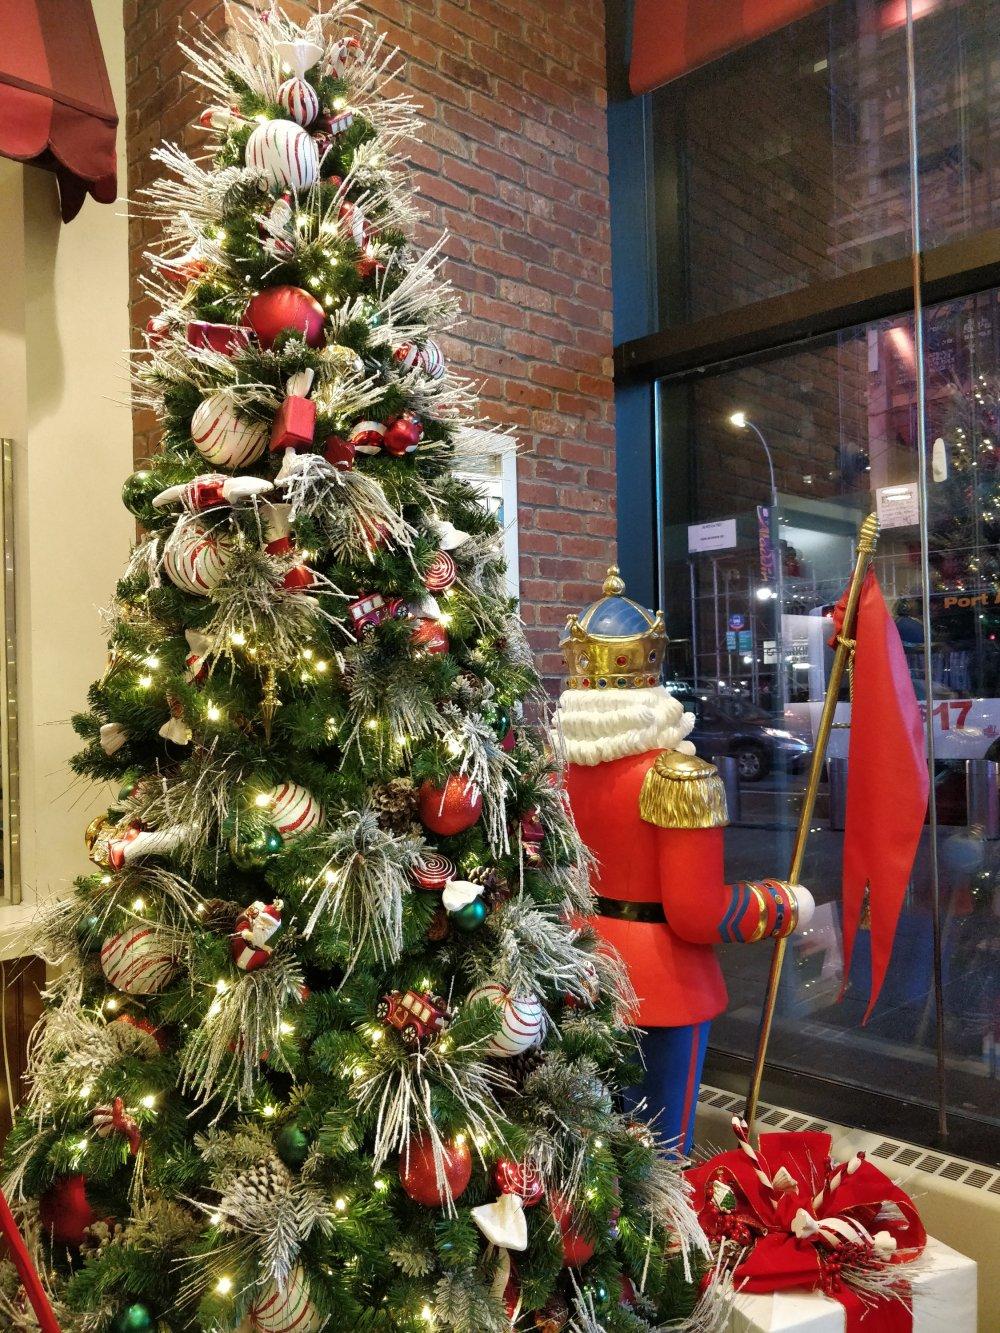 Feliz Navidad Joyeux Noel 2019.Merry Christmas Joyeux Noel Feliz Navidad Avrils